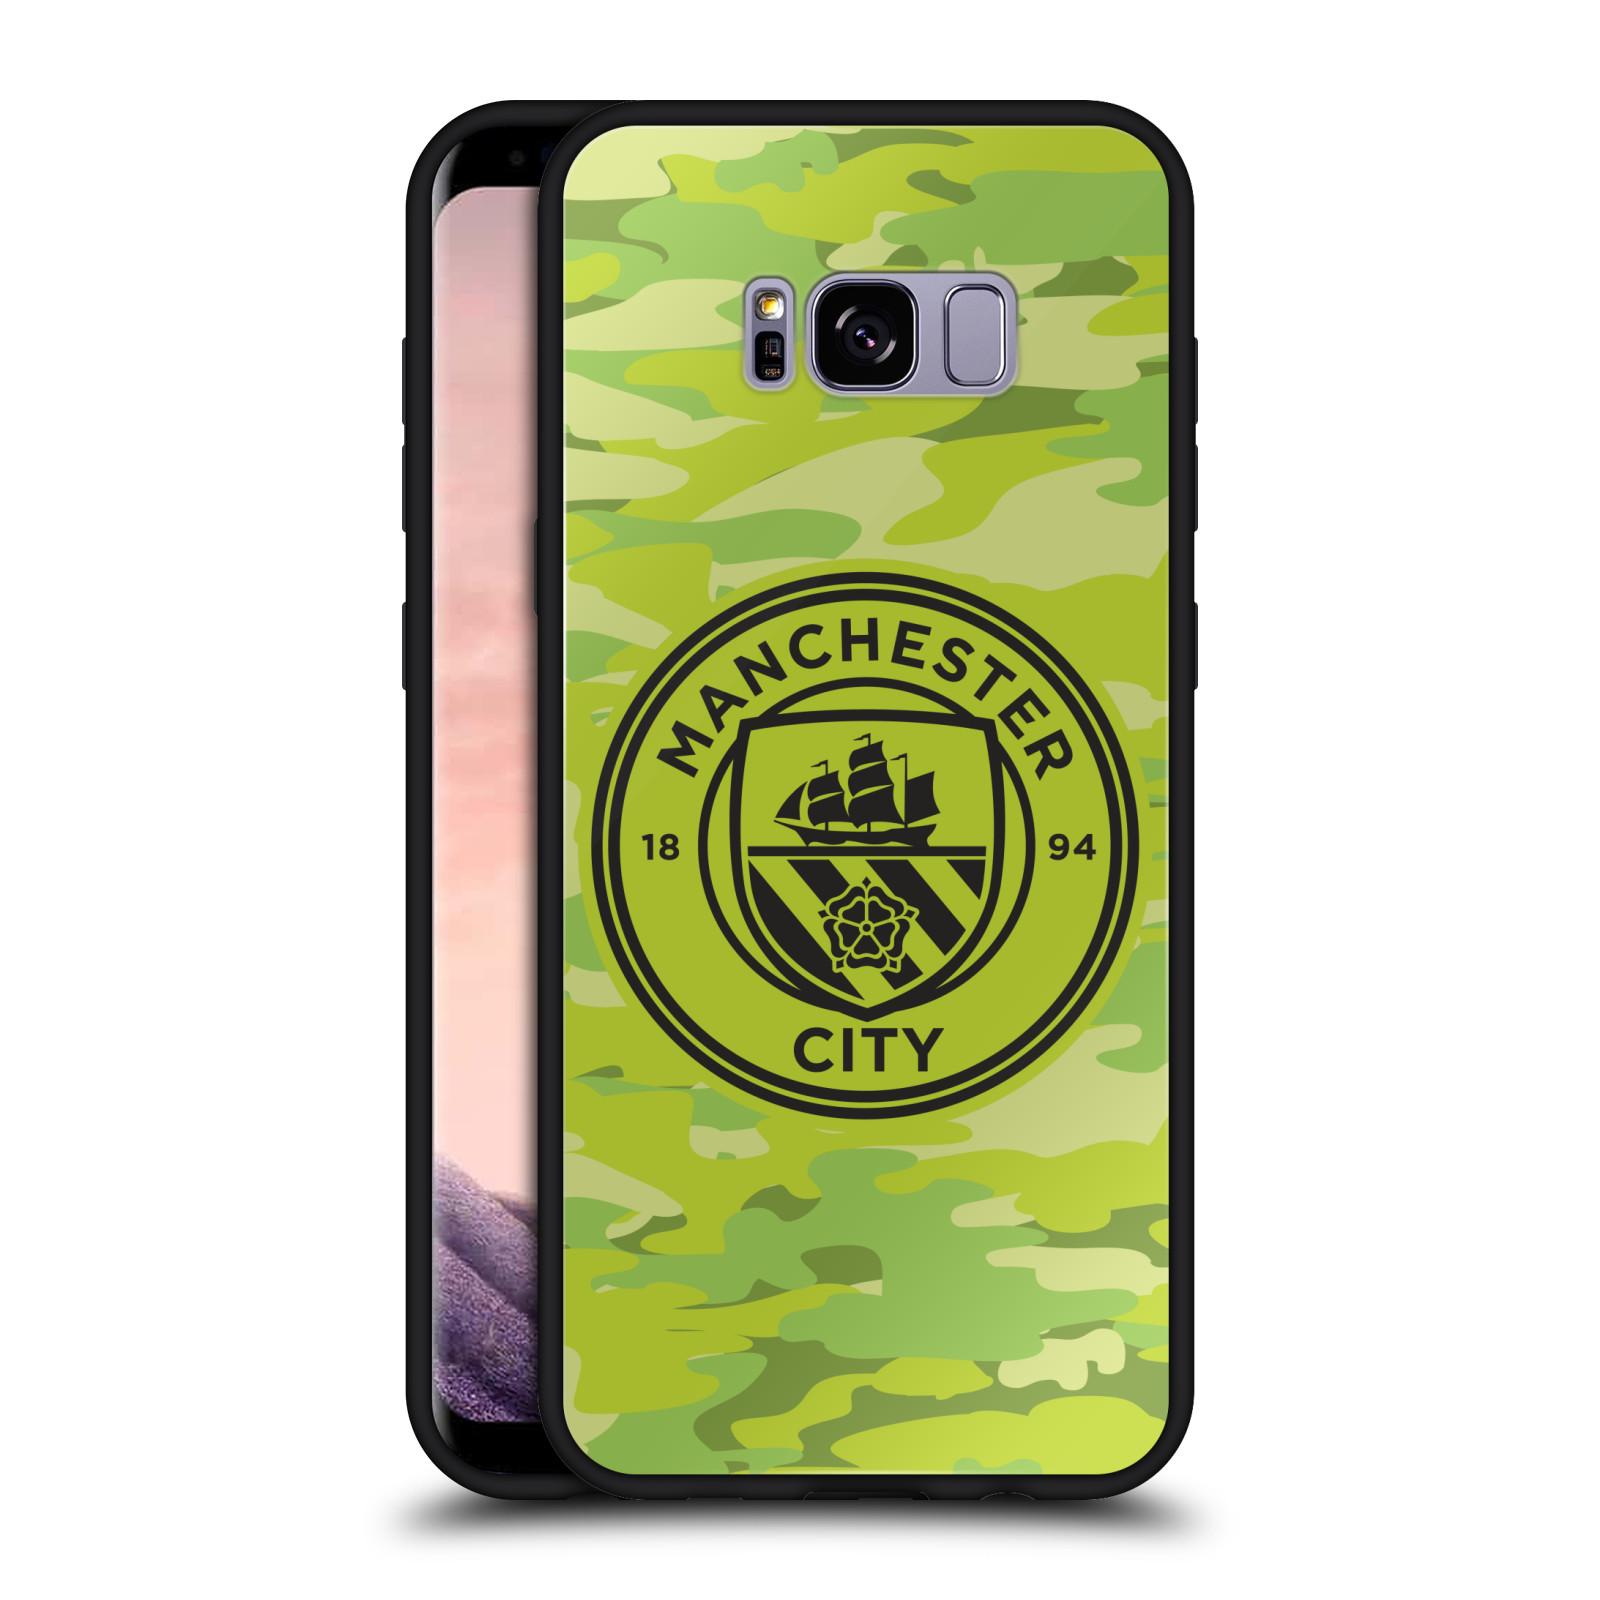 MAN-CITY-FC-BADGE-CAMOU-BLACK-HYBRID-GLASS-BACK-CASE-FOR-SAMSUNG-PHONES